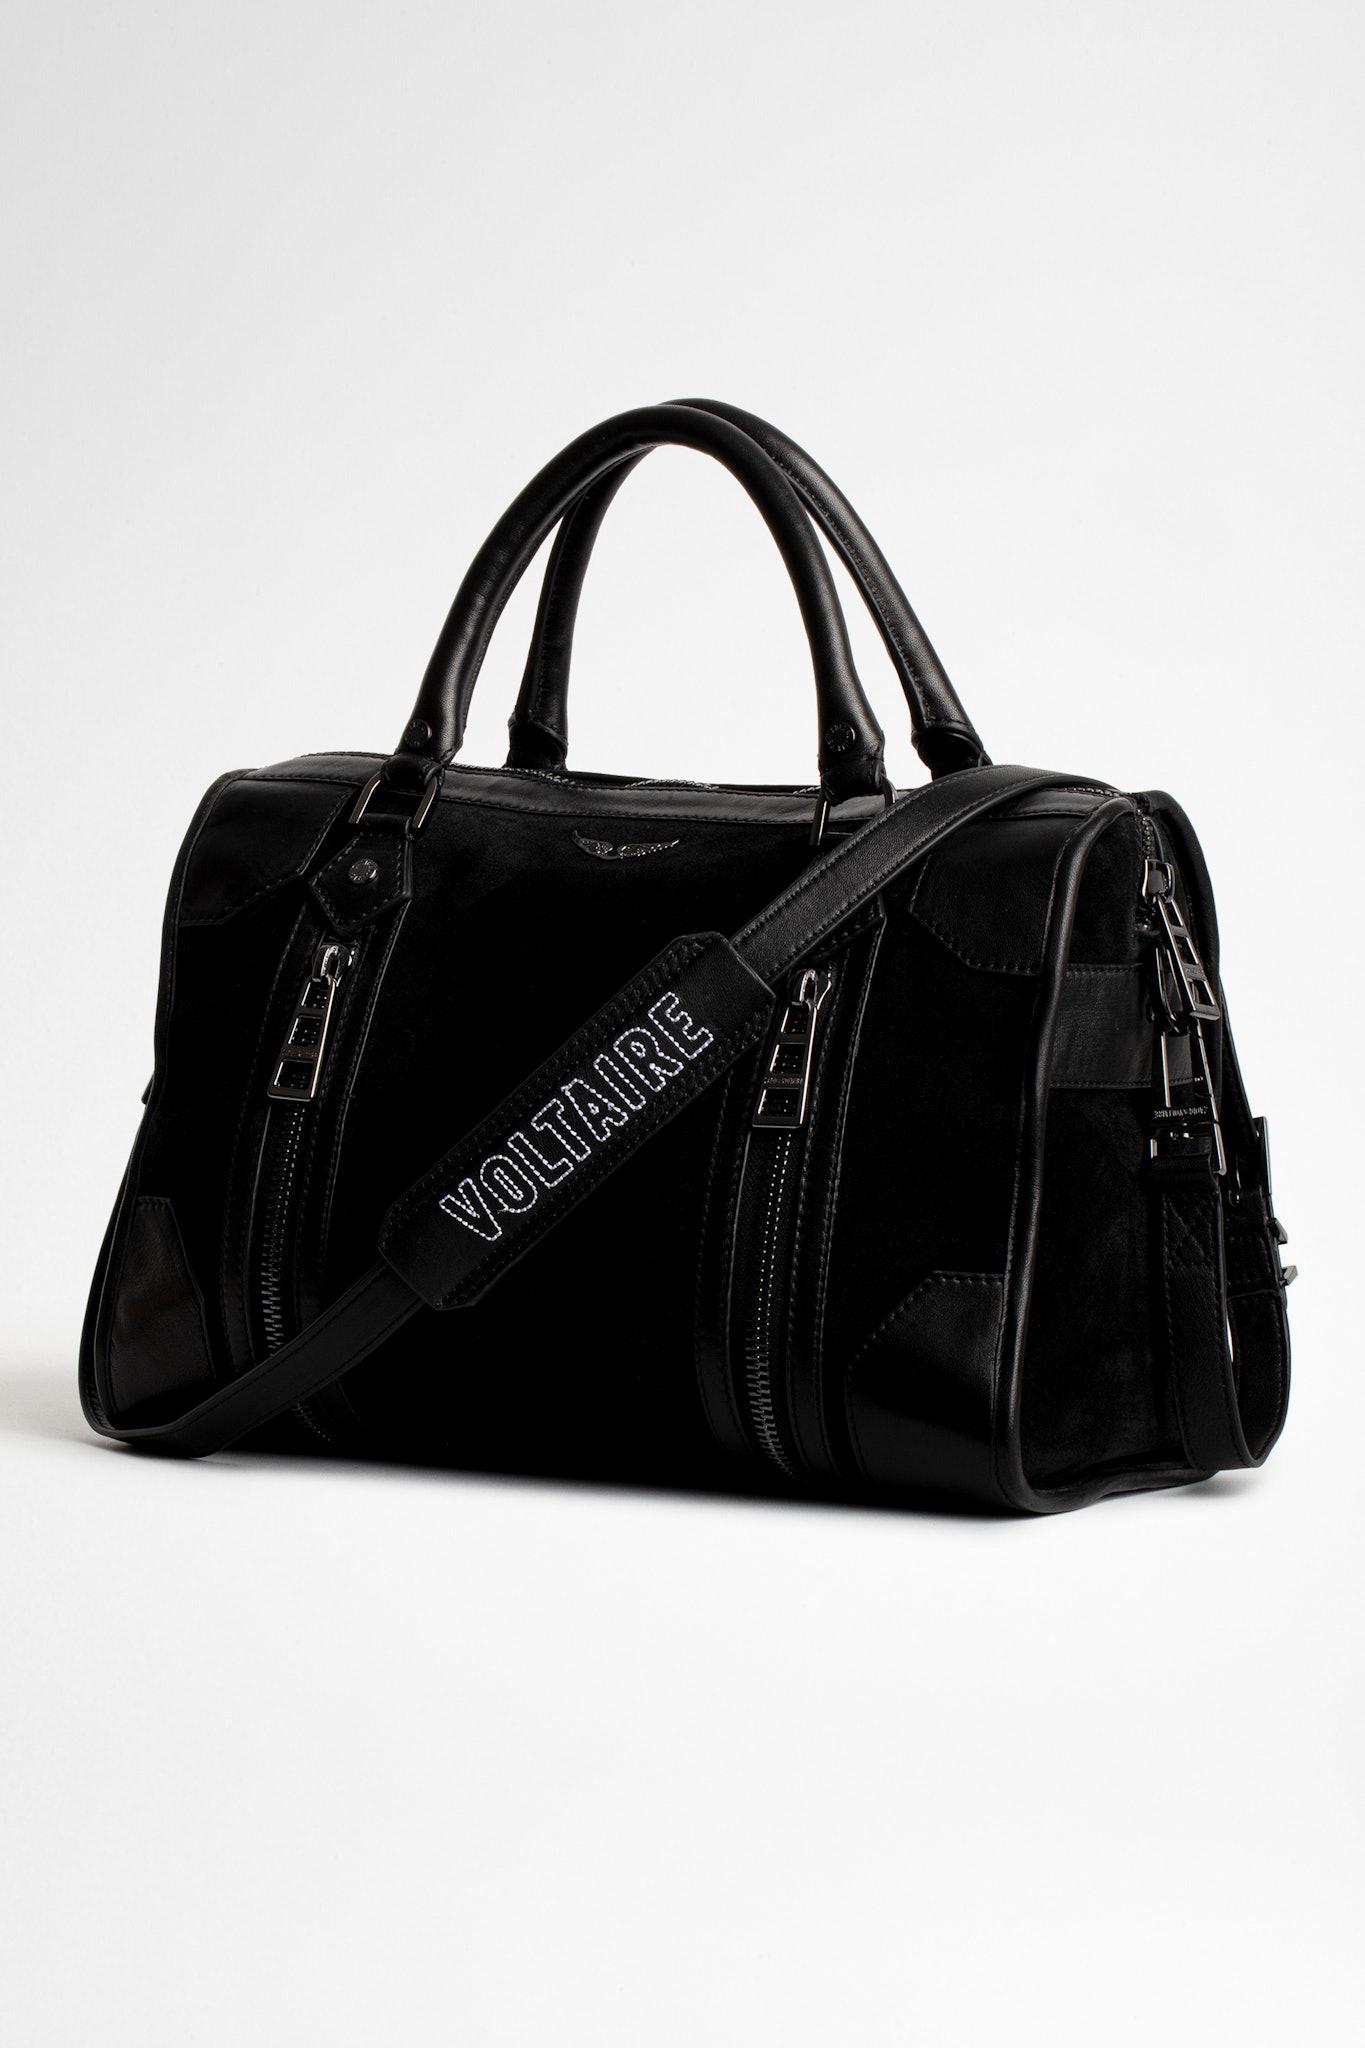 Sunny Medium #2 Suede Bag